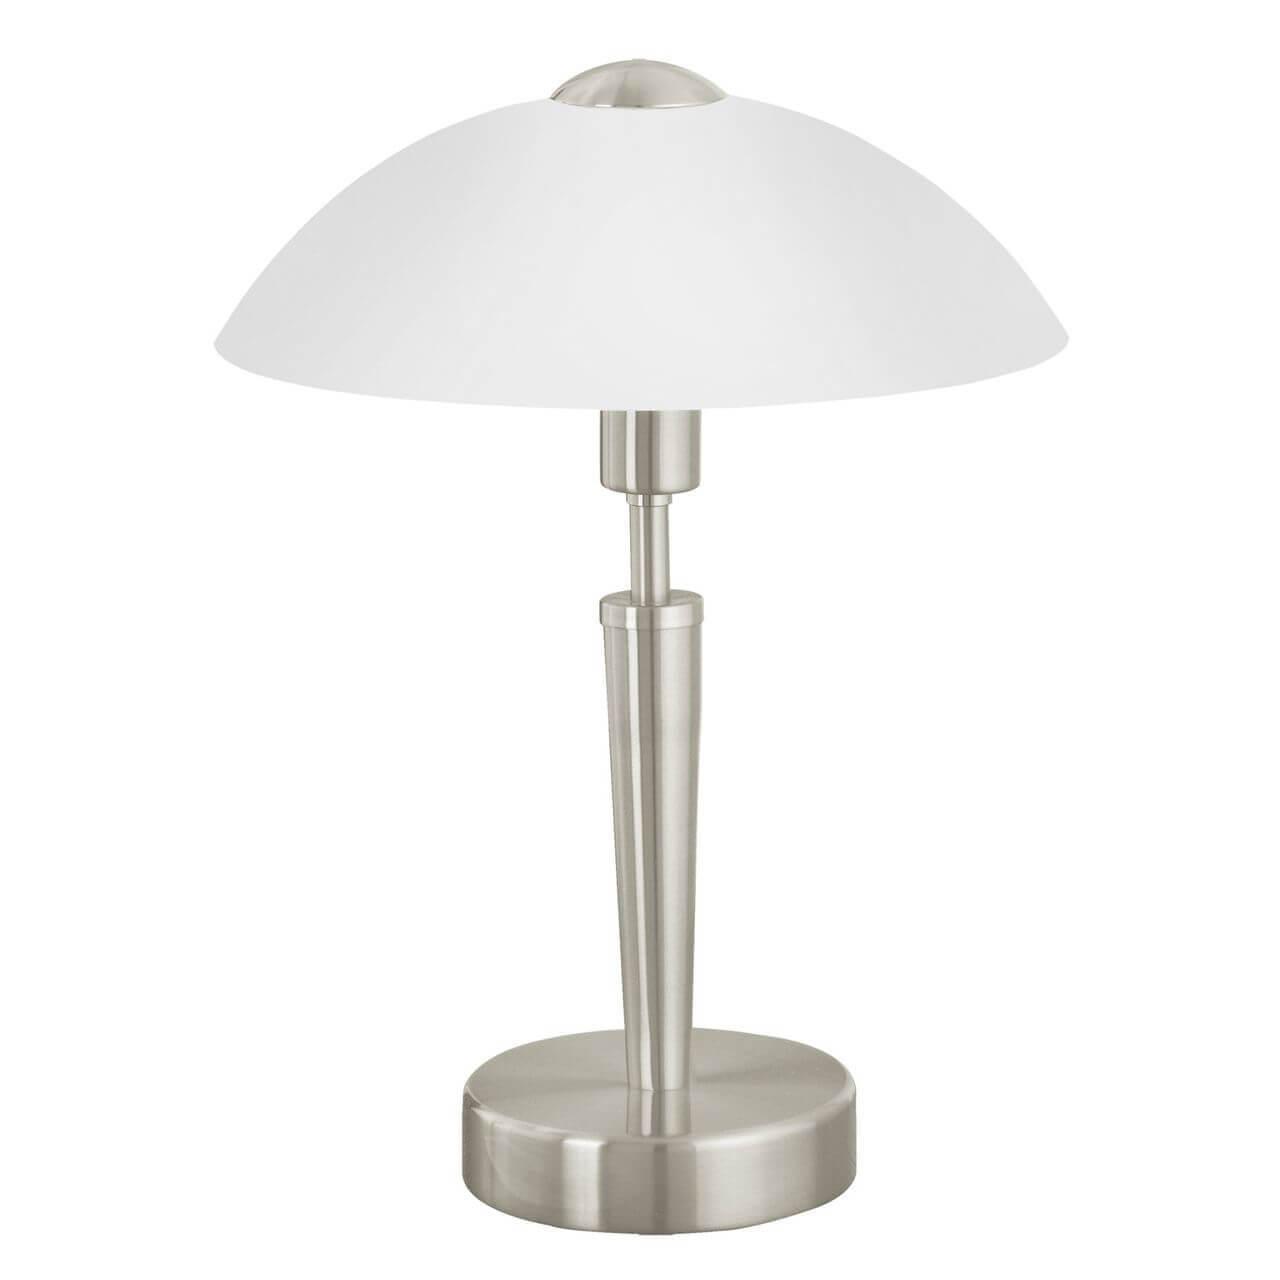 цена на Настольная лампа Eglo 85104 Solo